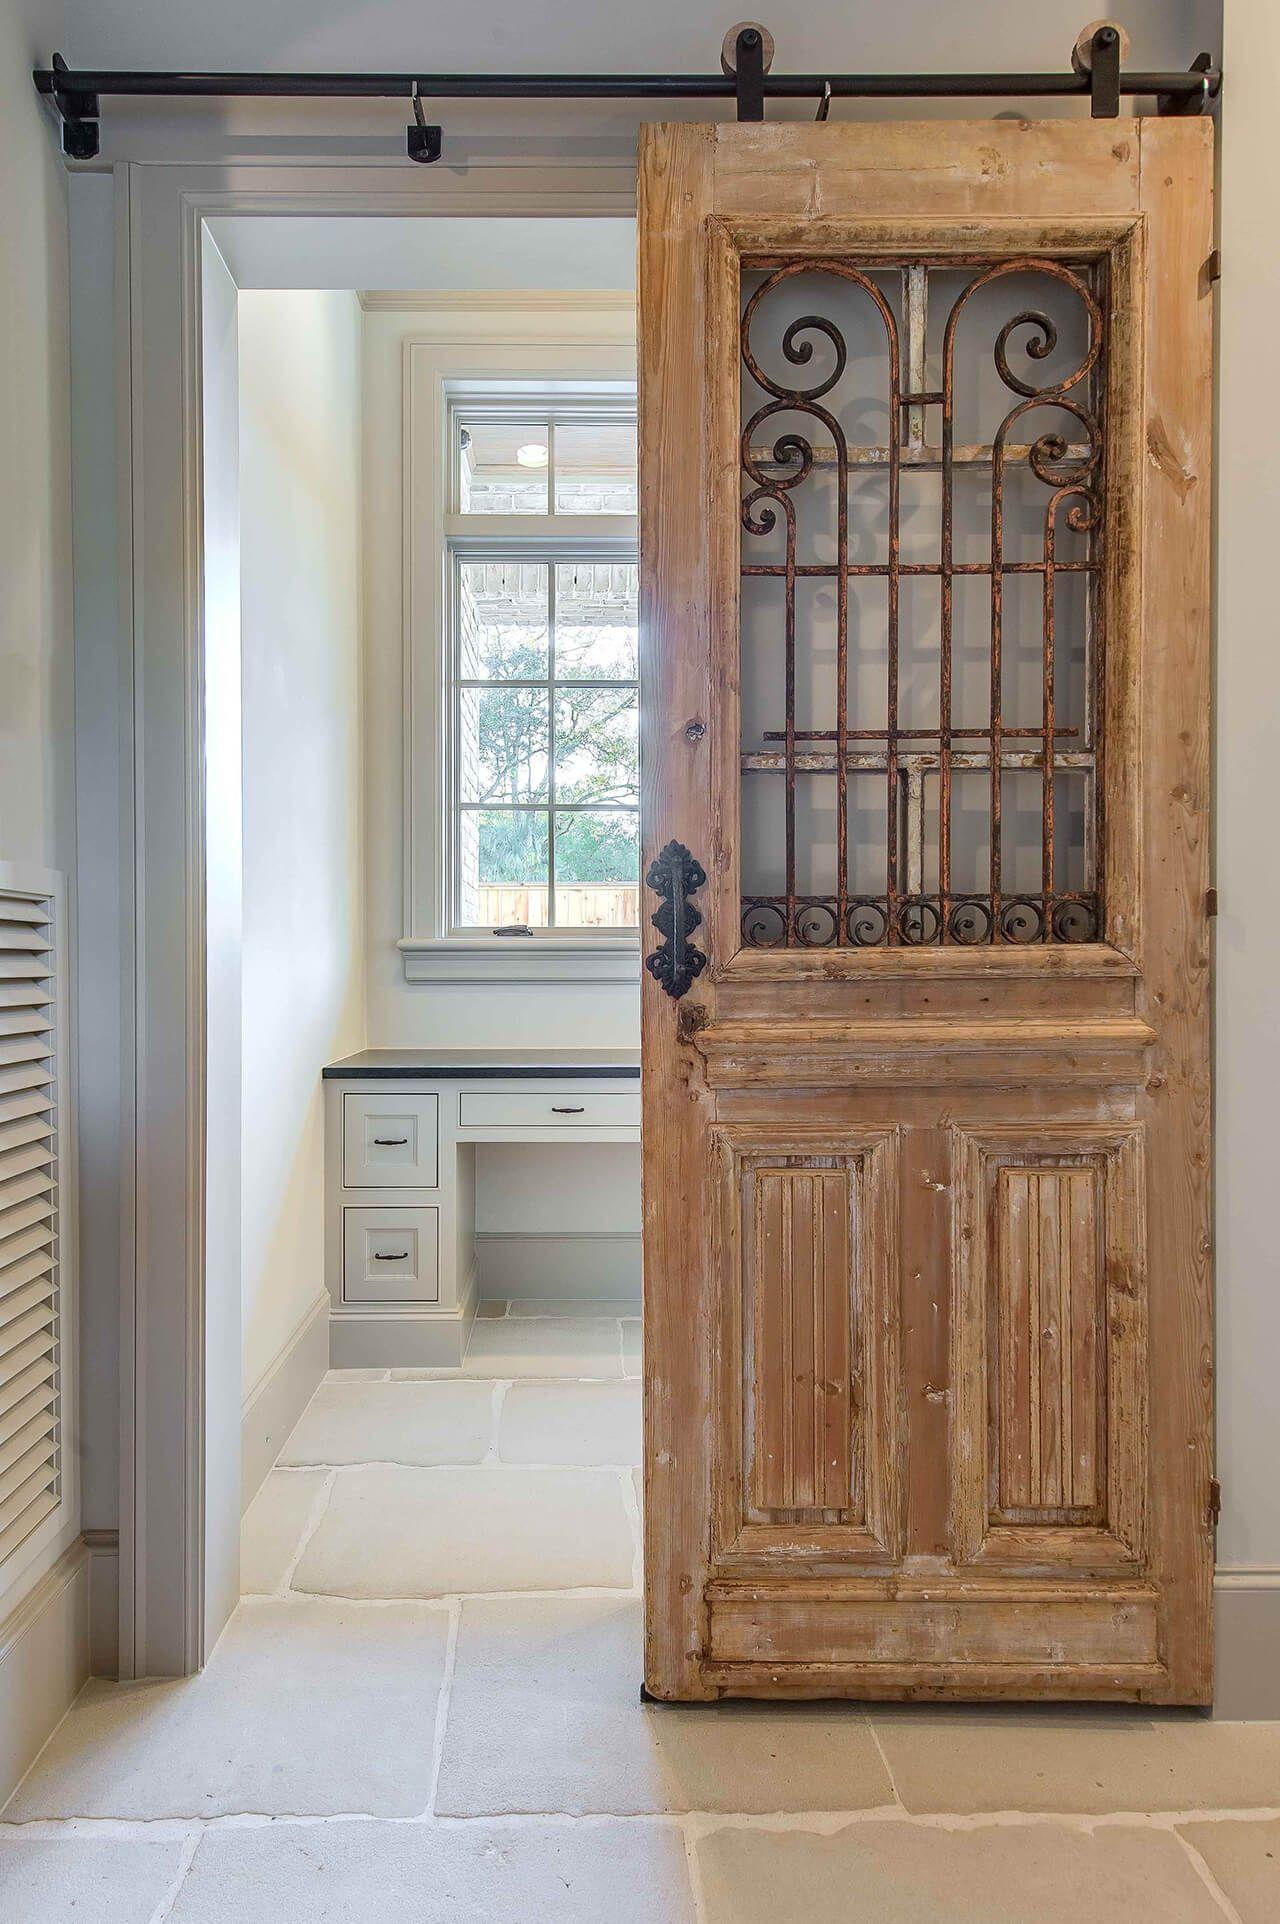 33 Artistic And Practical Repurposed Old Door Ideas